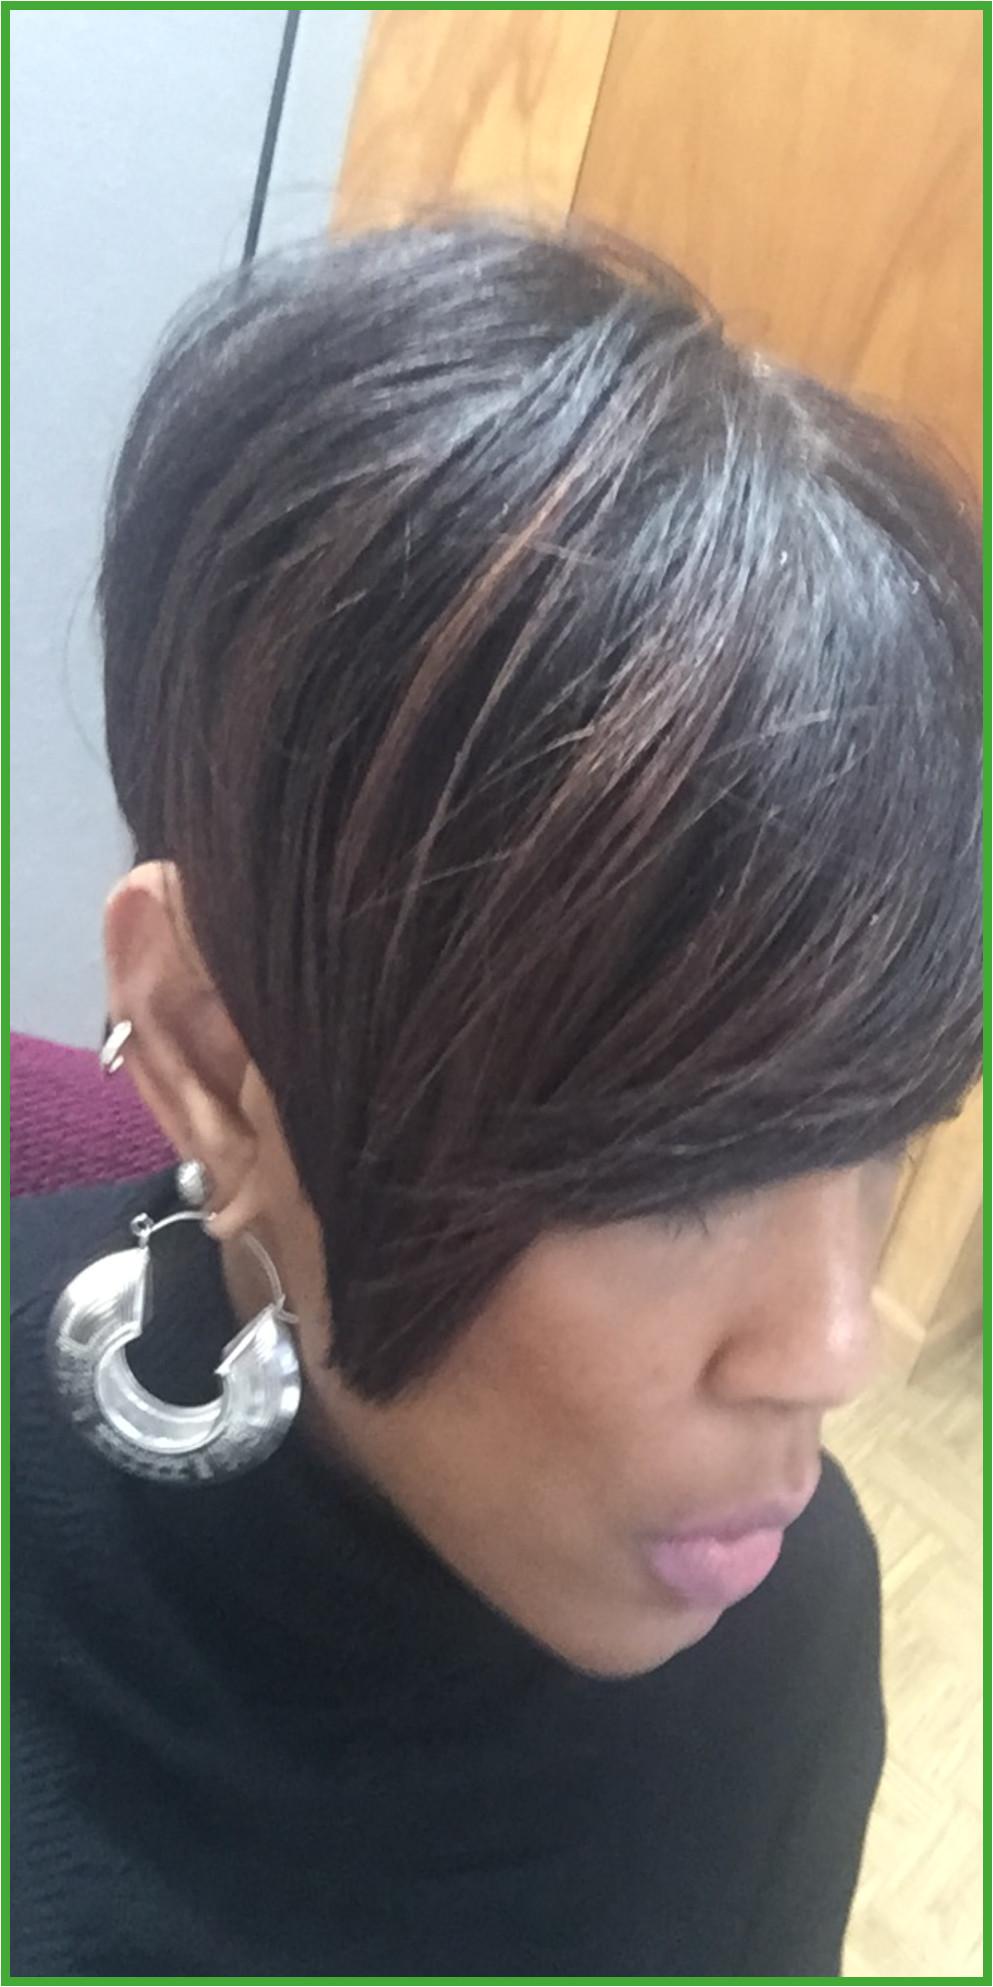 Short Hairstyles Grey Hair Gallery Short Hairstyles for Grey Hair Gallery Elegant Bob Hairstyles 2018